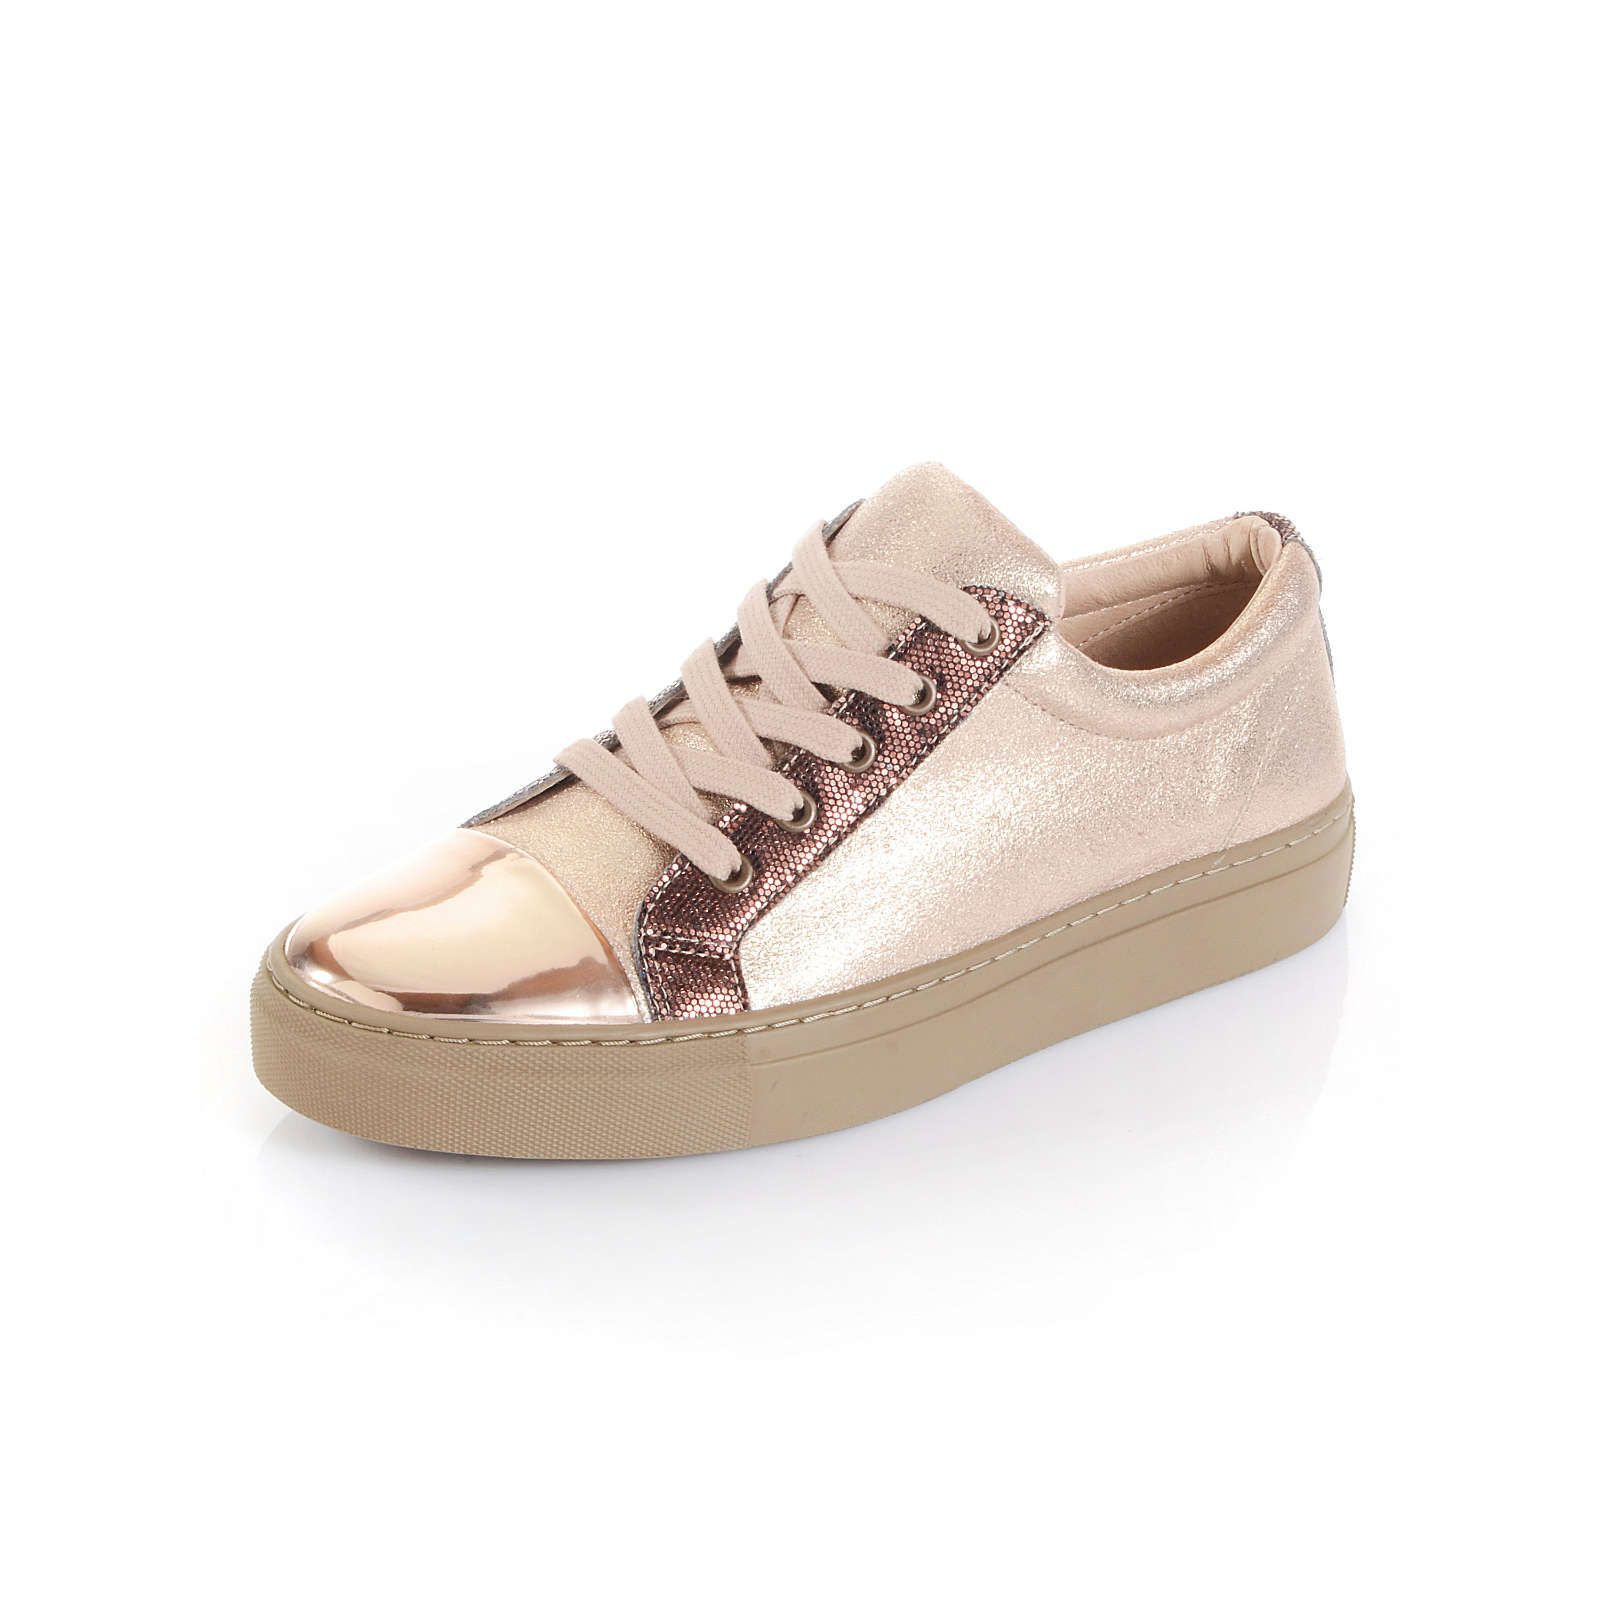 Alba Moda Sneakers Low rosegold Damen Gr. 37